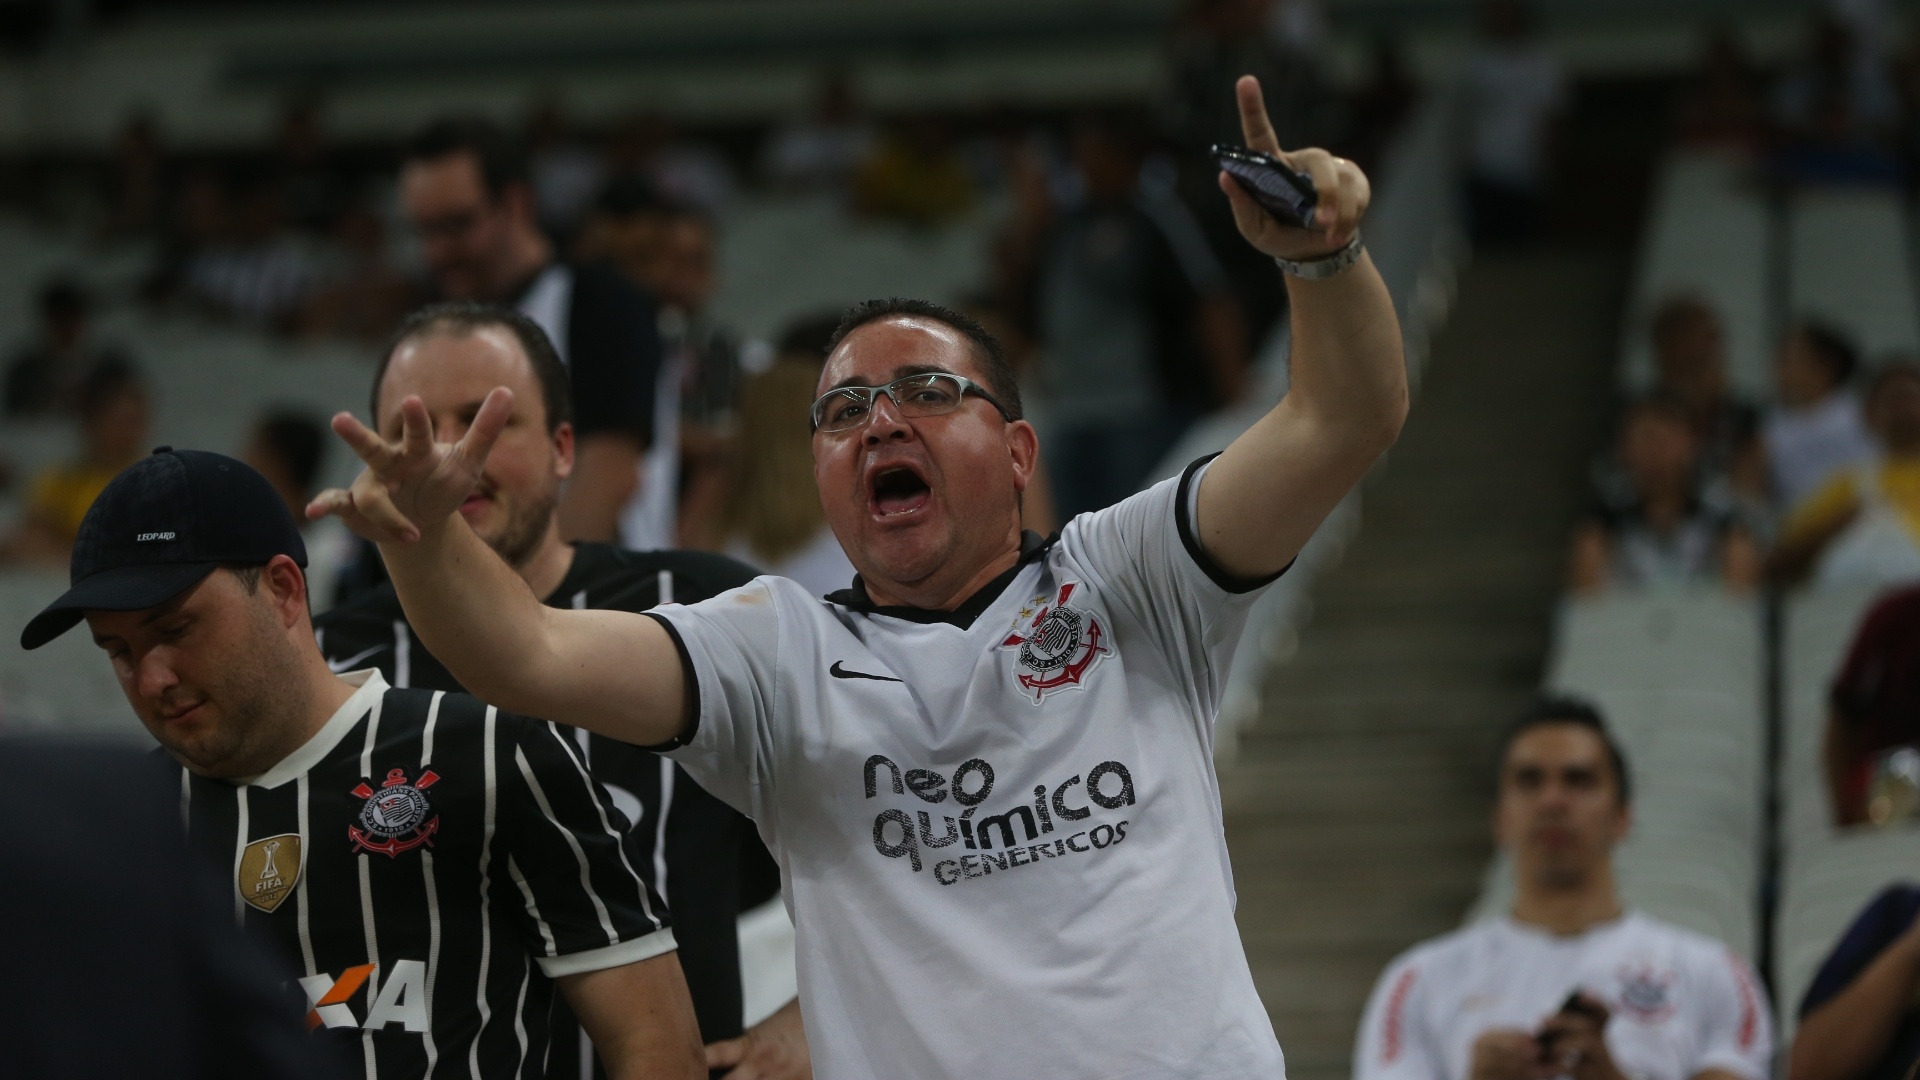 Torcedor acompanha partida entre Corinthians e Goiás na Arena Corinthians pela 30ª rodada do Campeonato Brasileiro